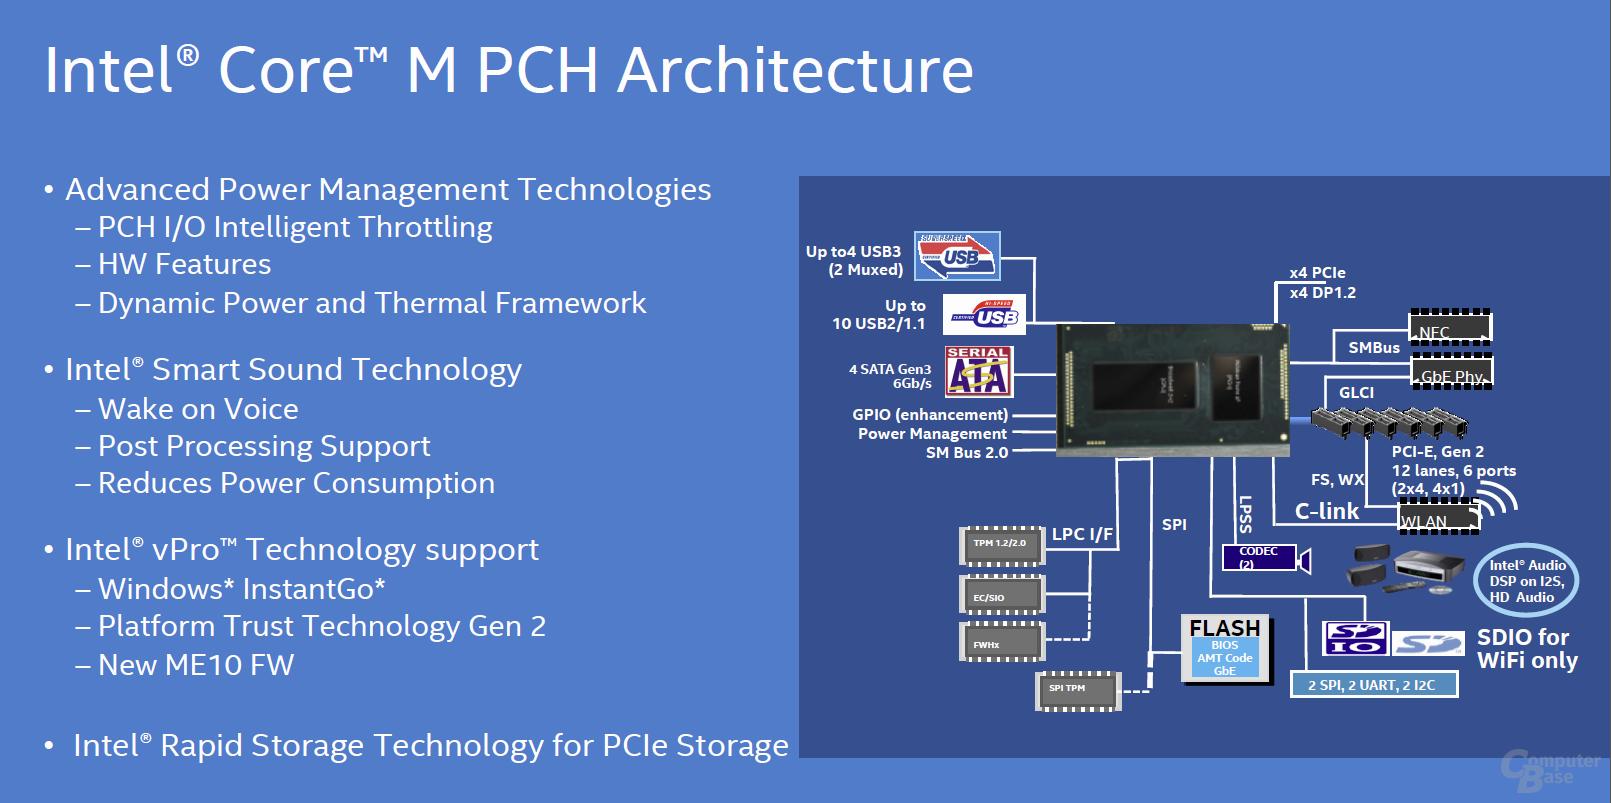 Intel Core M PCH